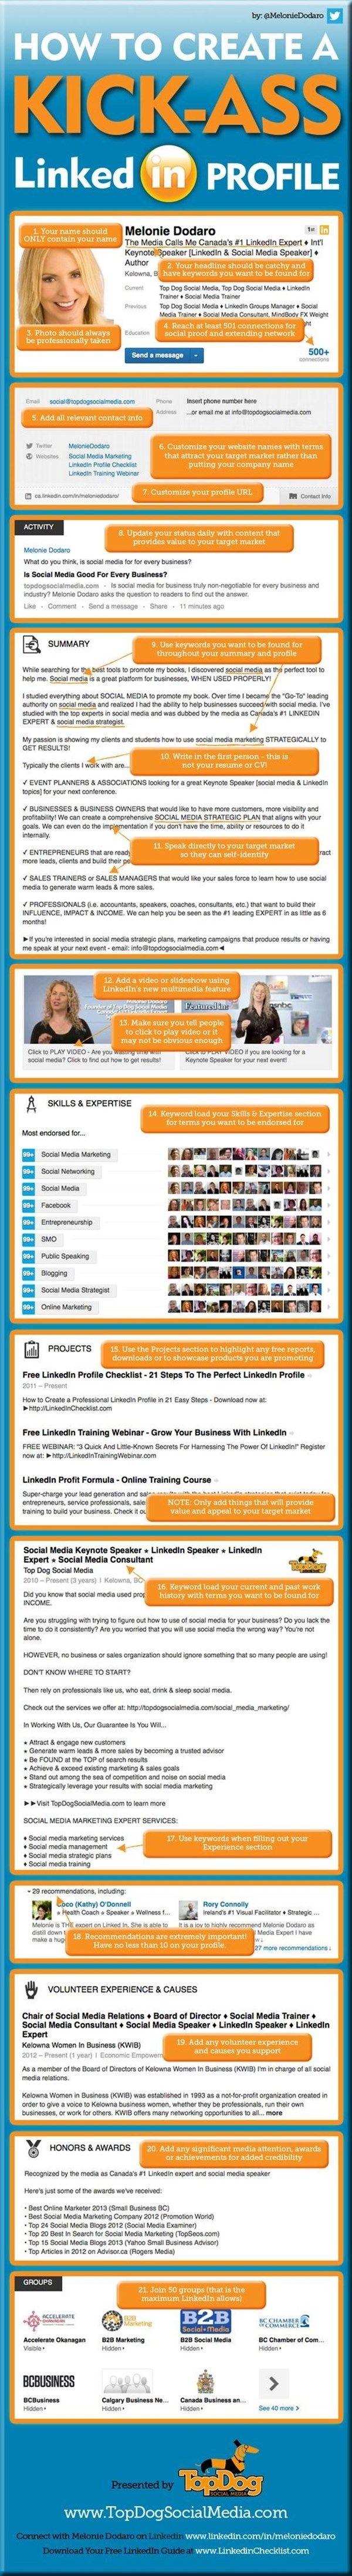 How to Develop a Kick-Ass LinkedIn Profile